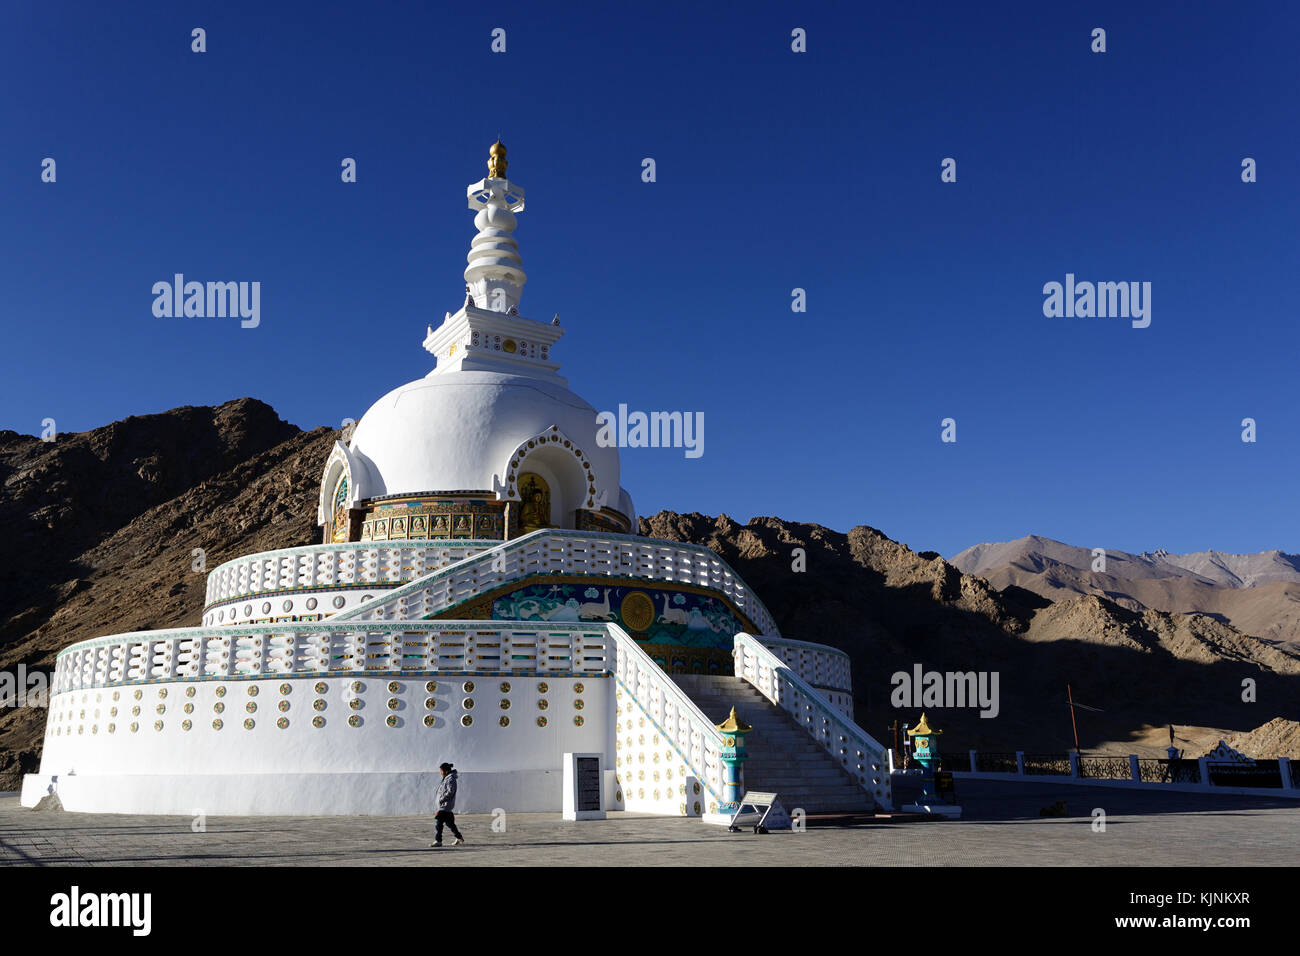 Shanti Stupa in Leh, Ladakh, Jammu and Kashmir, India. Stock Photo